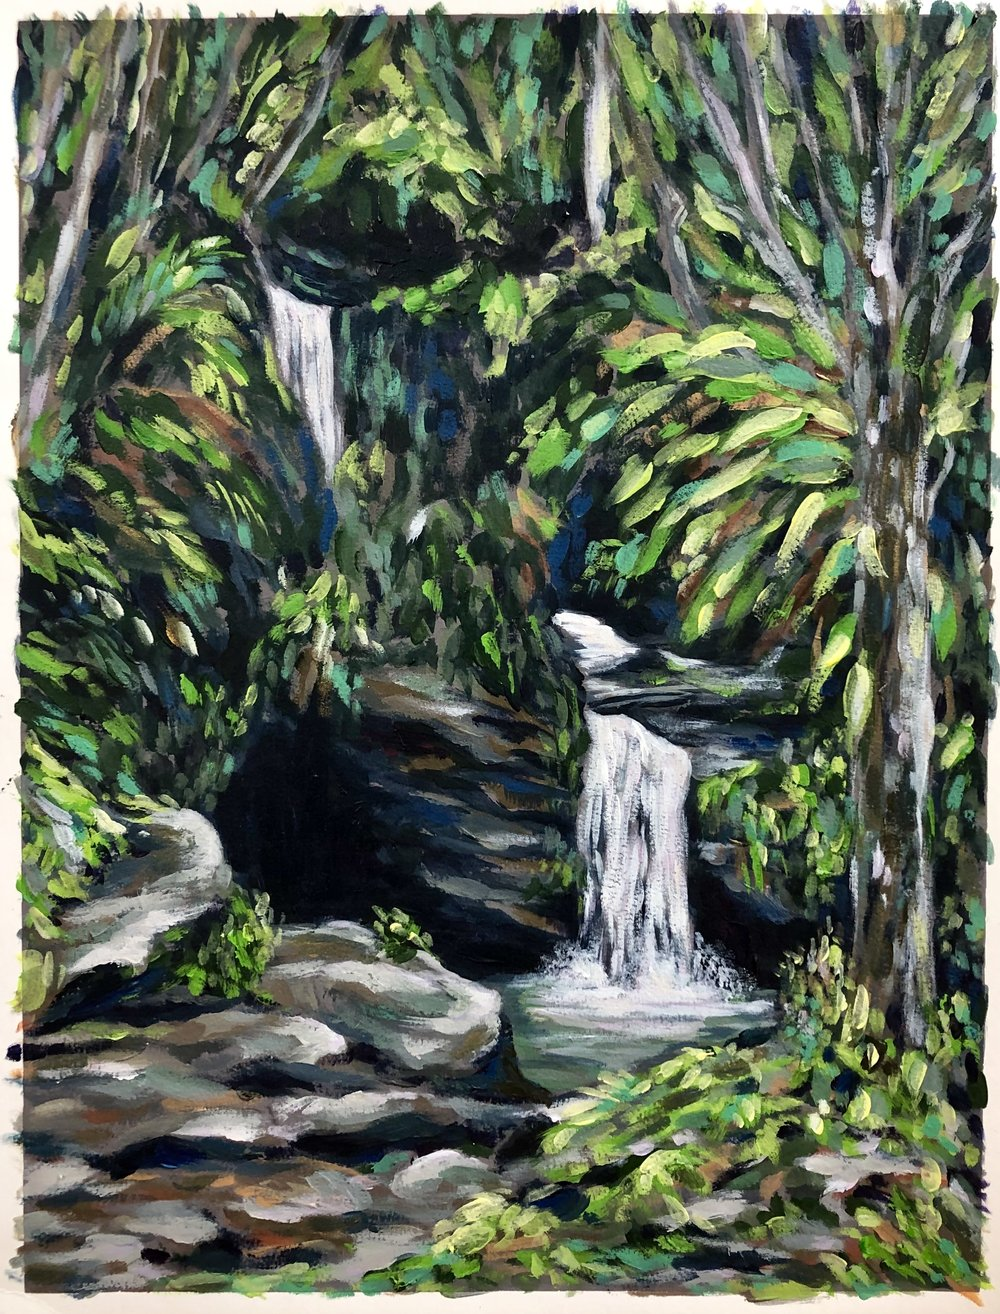 Diego Falls, El Yunque National Rain Forest, Puerto Rico